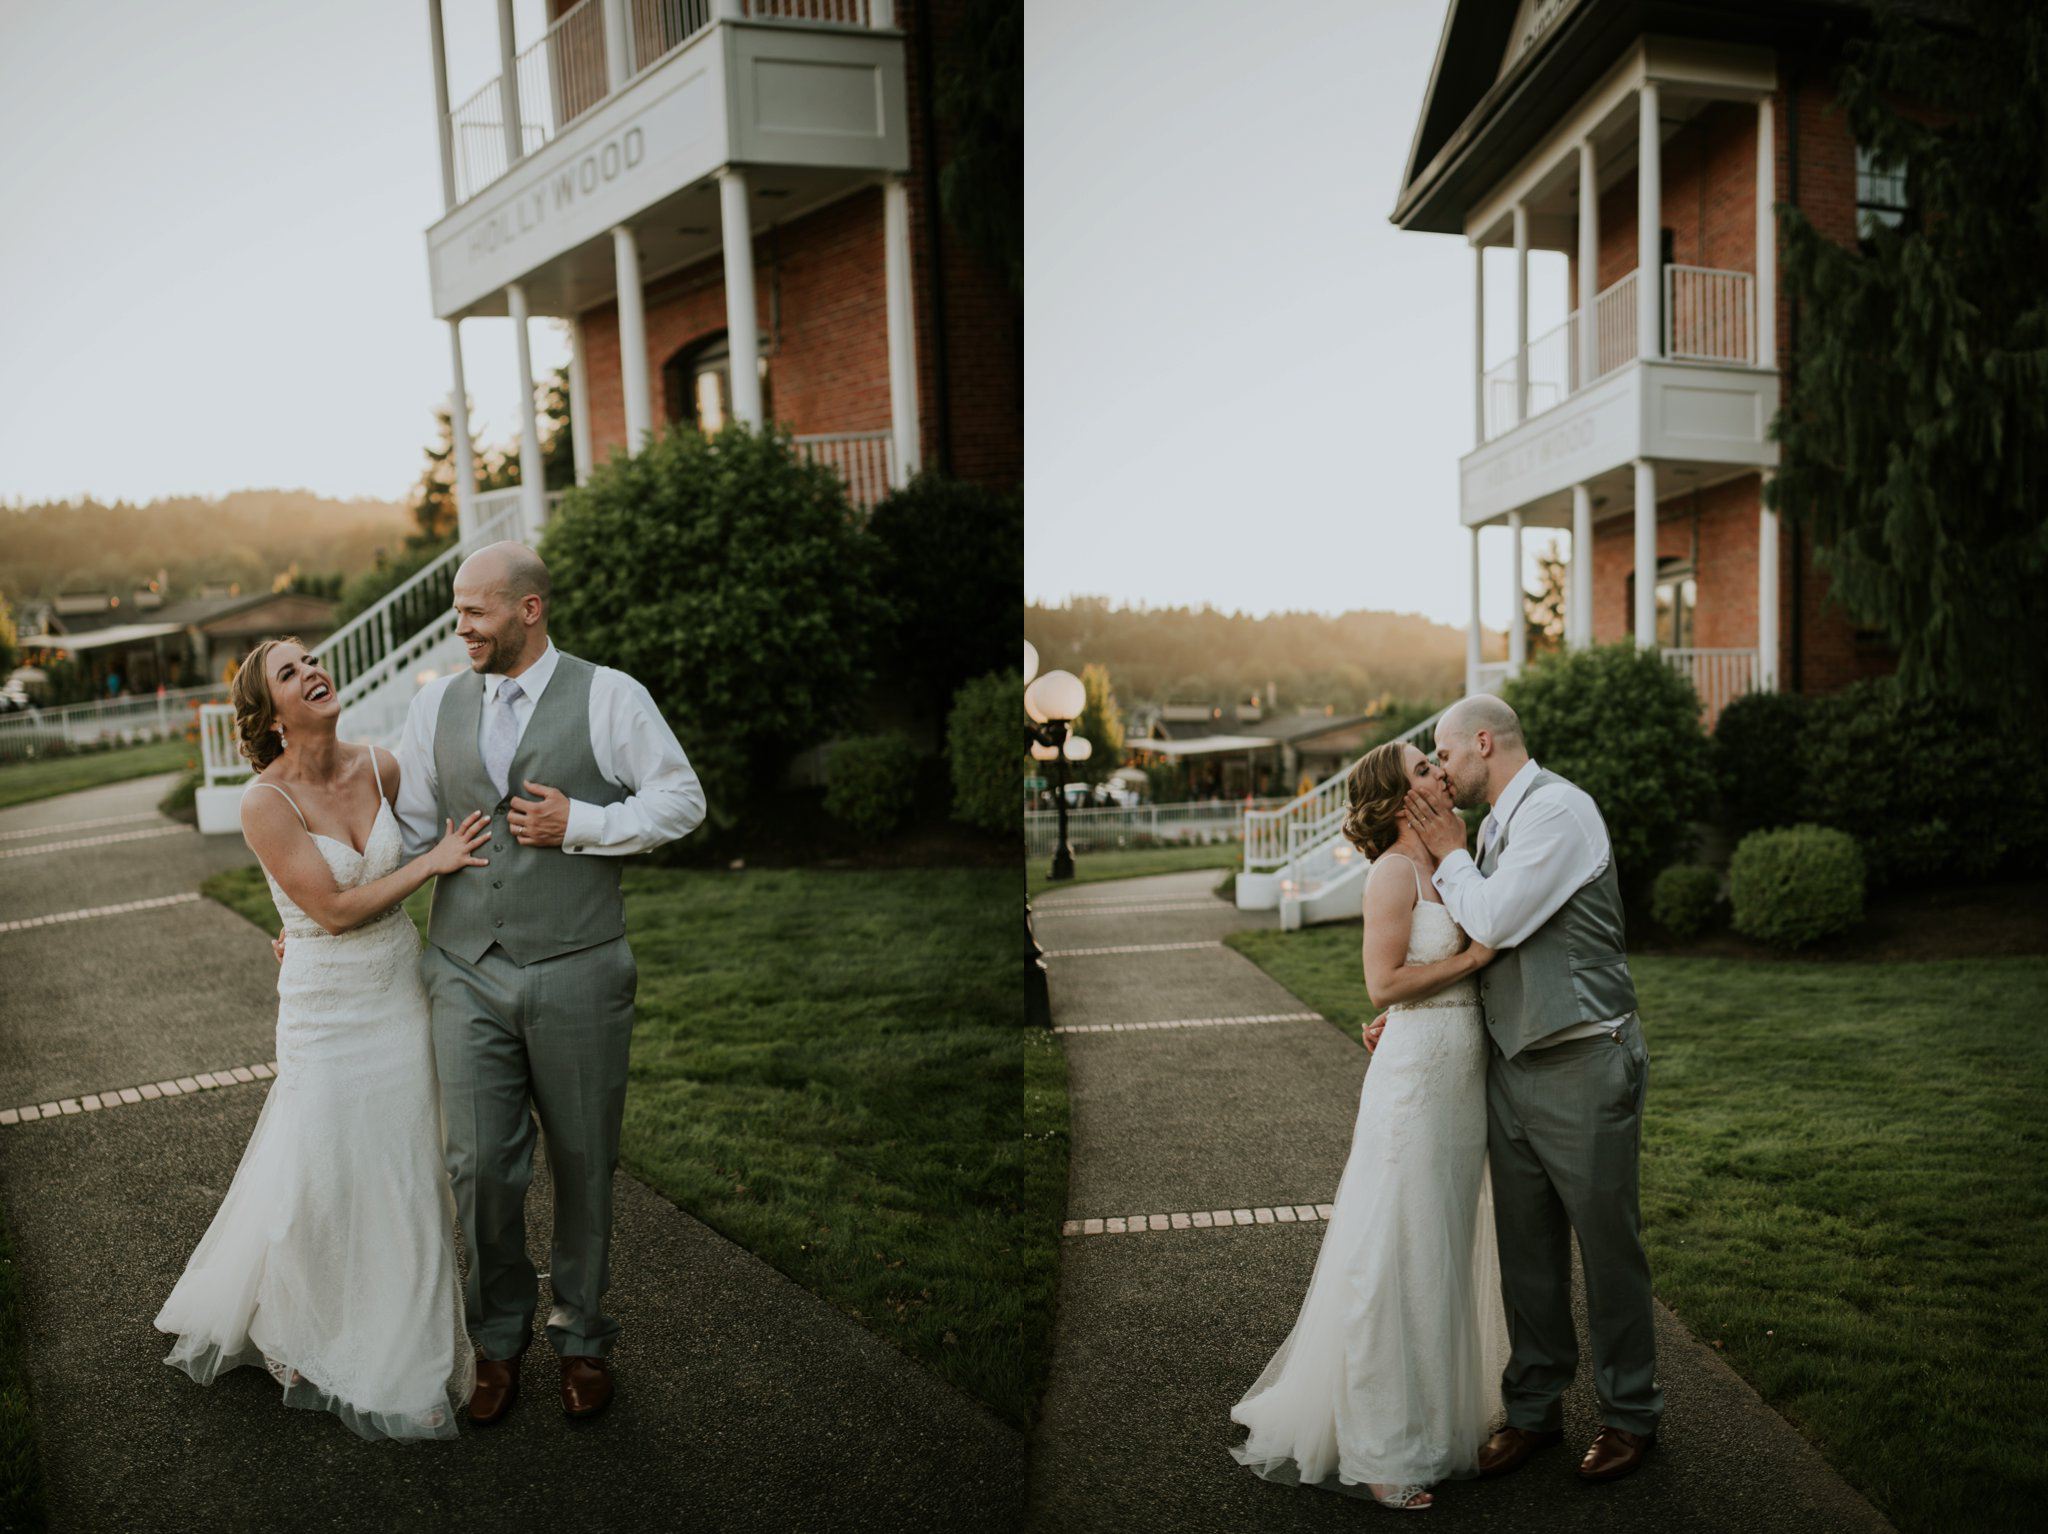 hollywood-school-house-wedding-seattle-photographer-caitlyn-nikula-108.jpg